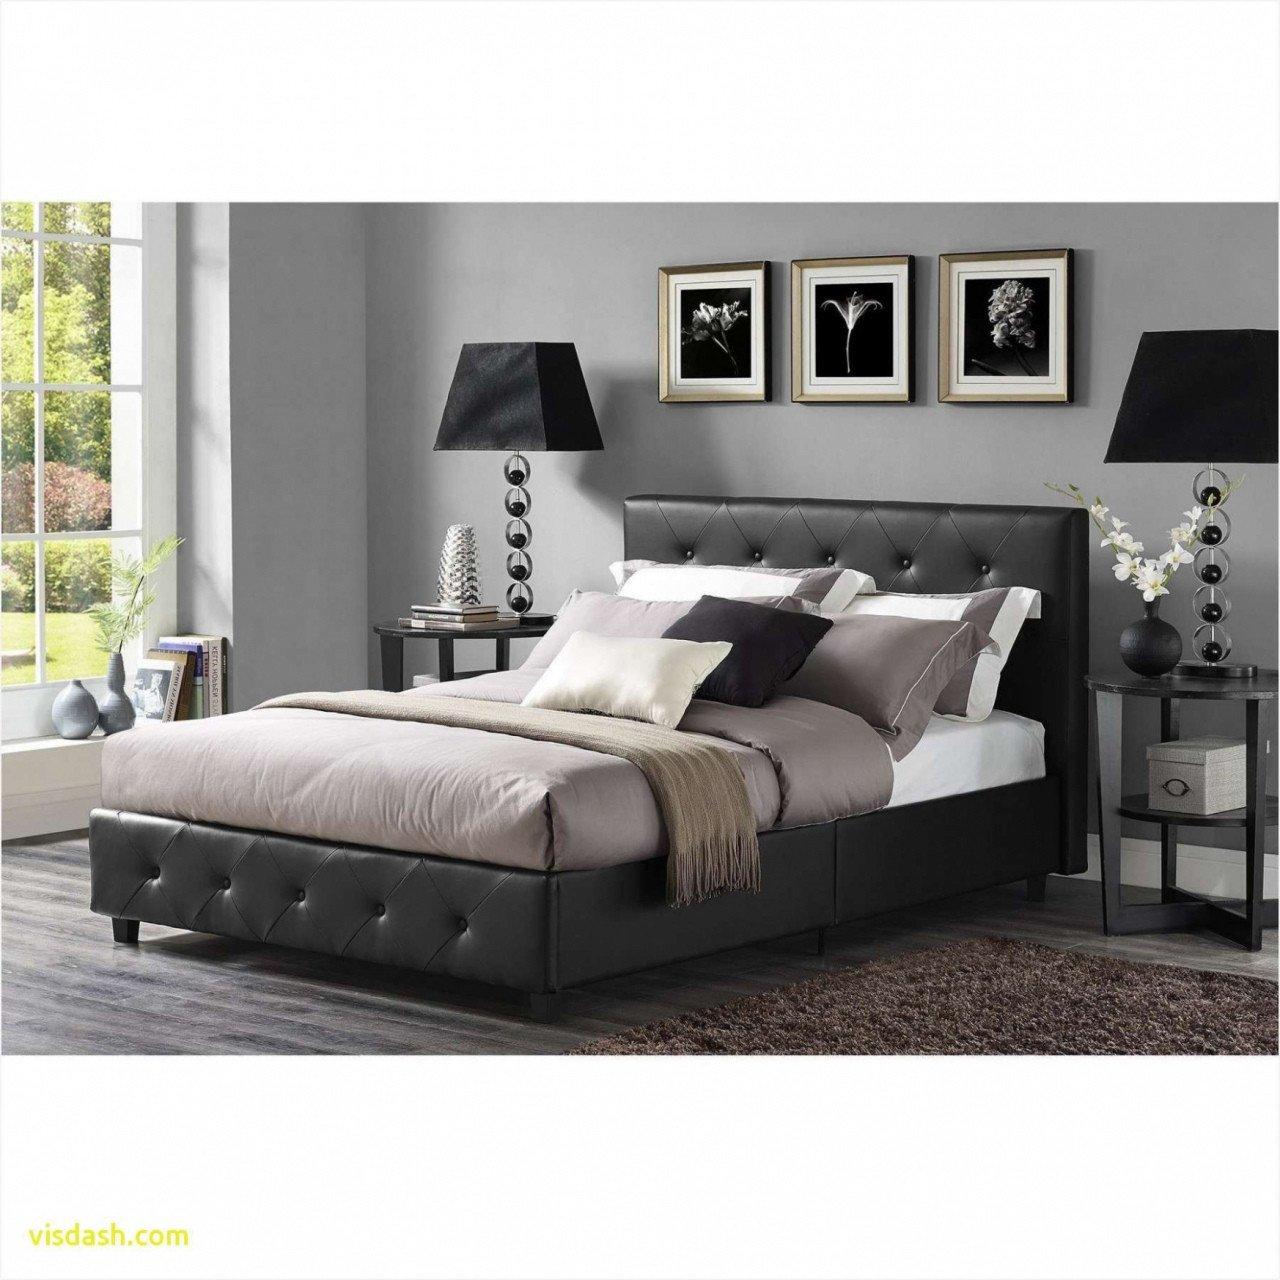 Girl Bedroom Set Full Unique Bedroom Sets Queen Loft Style Boho Elephant Bed In A Bag